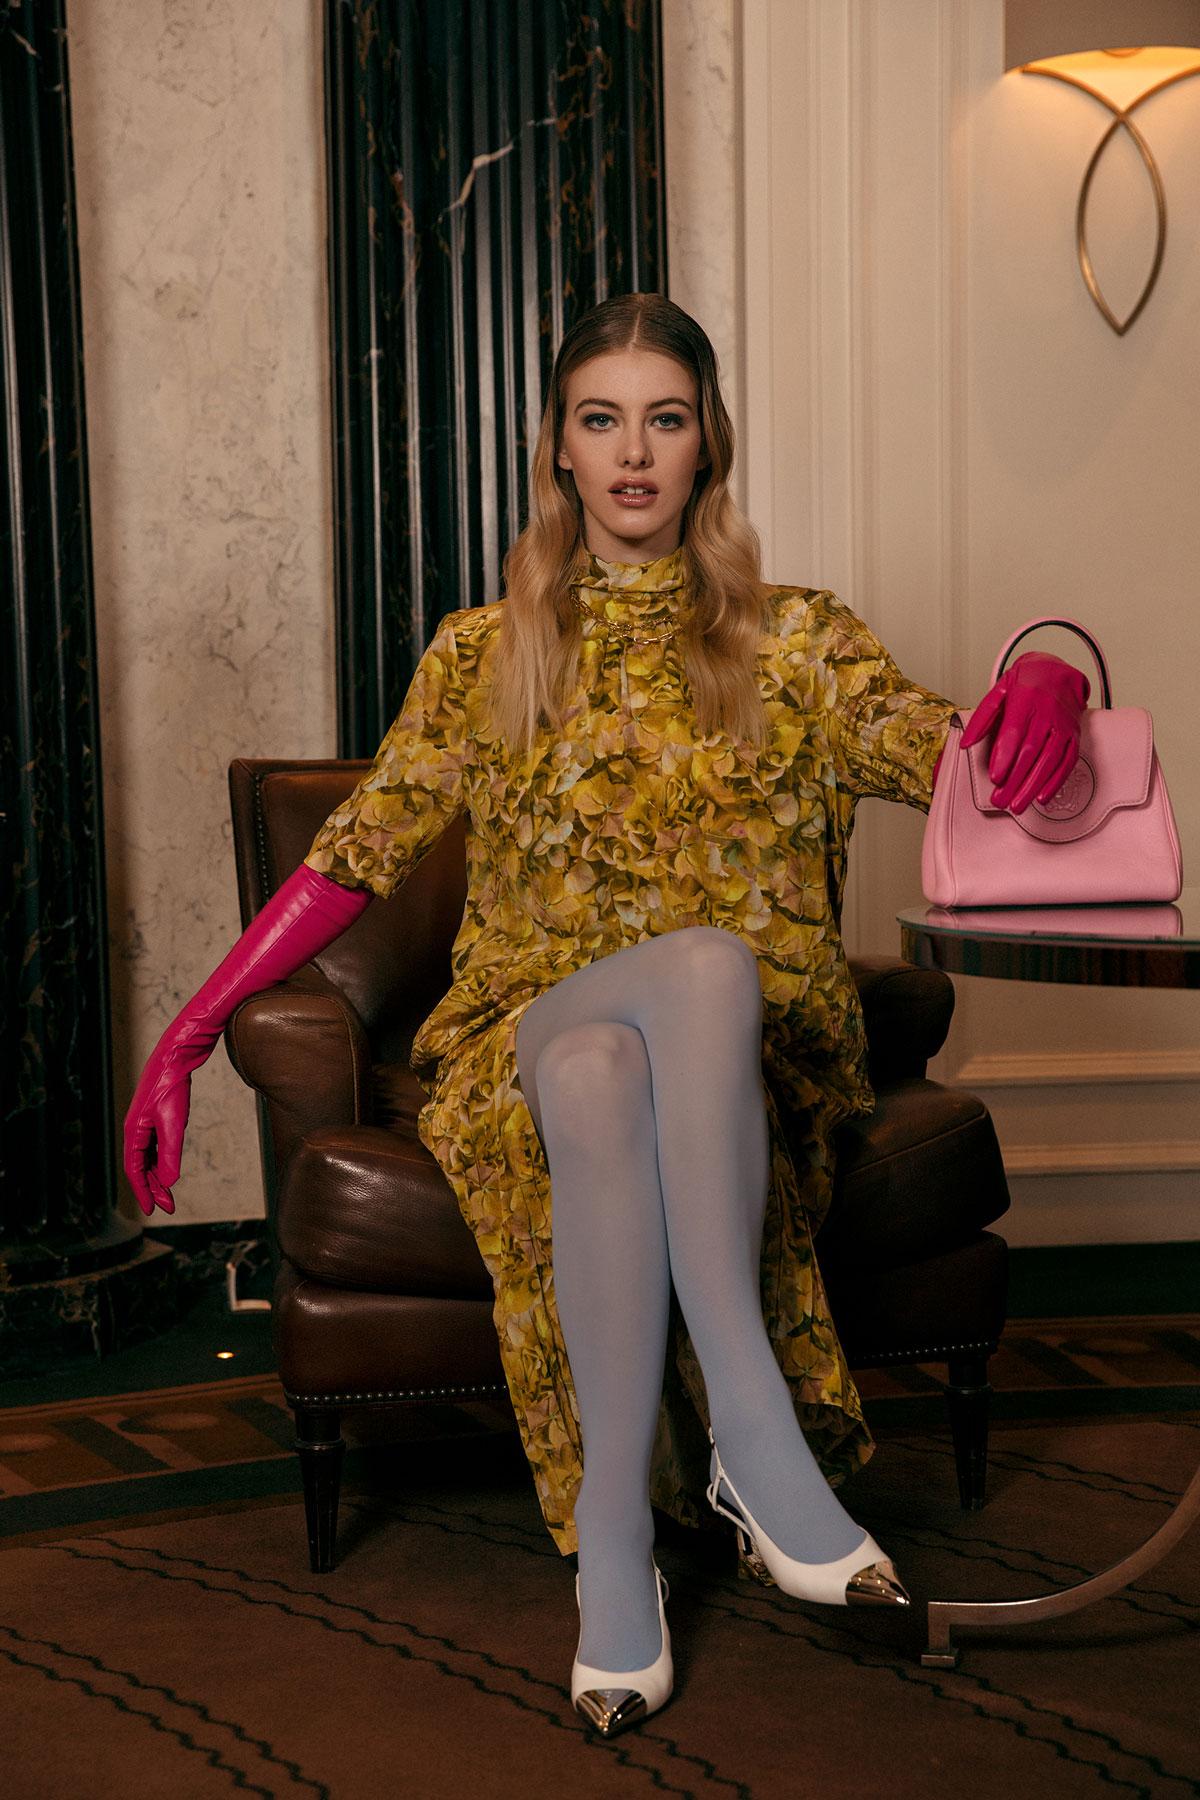 Melanie rieberer makeup artist editorial hair make-up Lofficiel Monaco